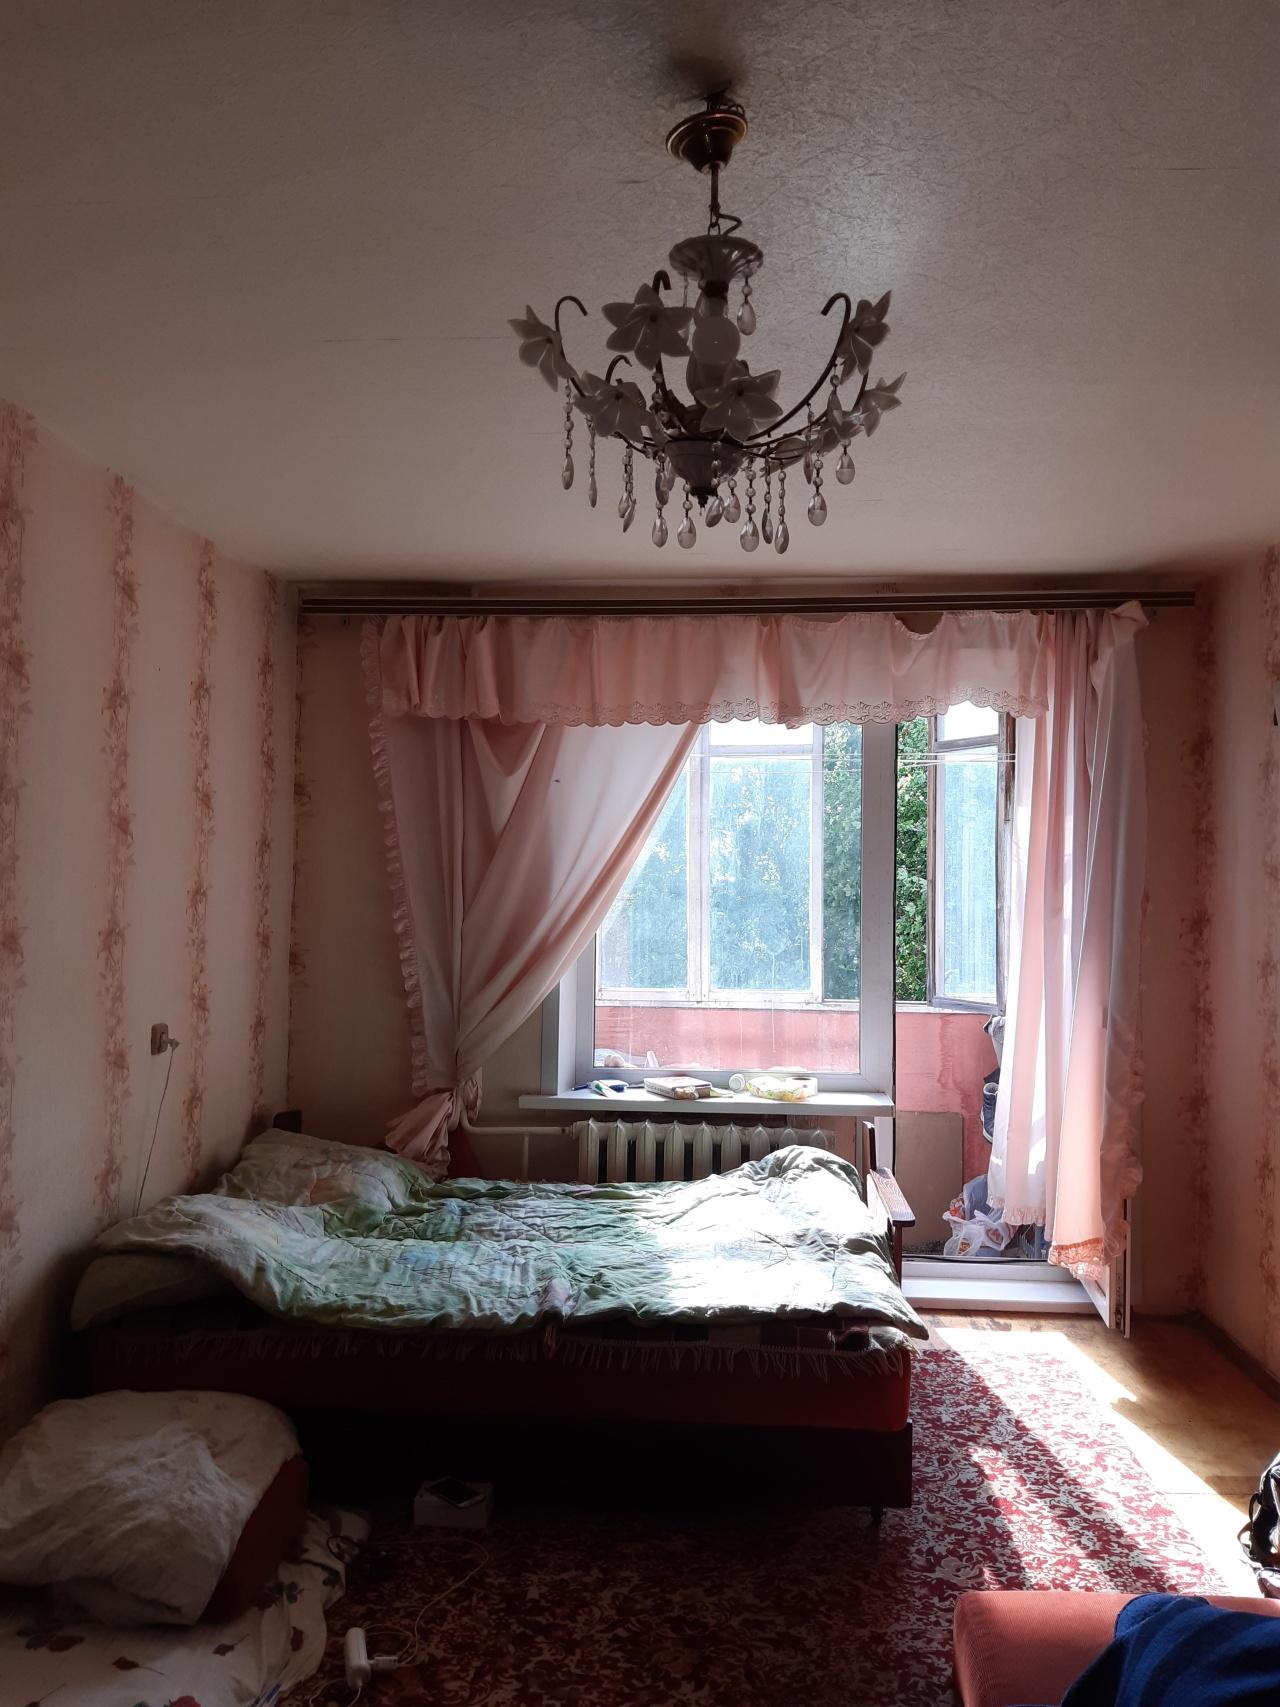 г. Владимир, Горького ул., 102, 2-к. квартира на продажу